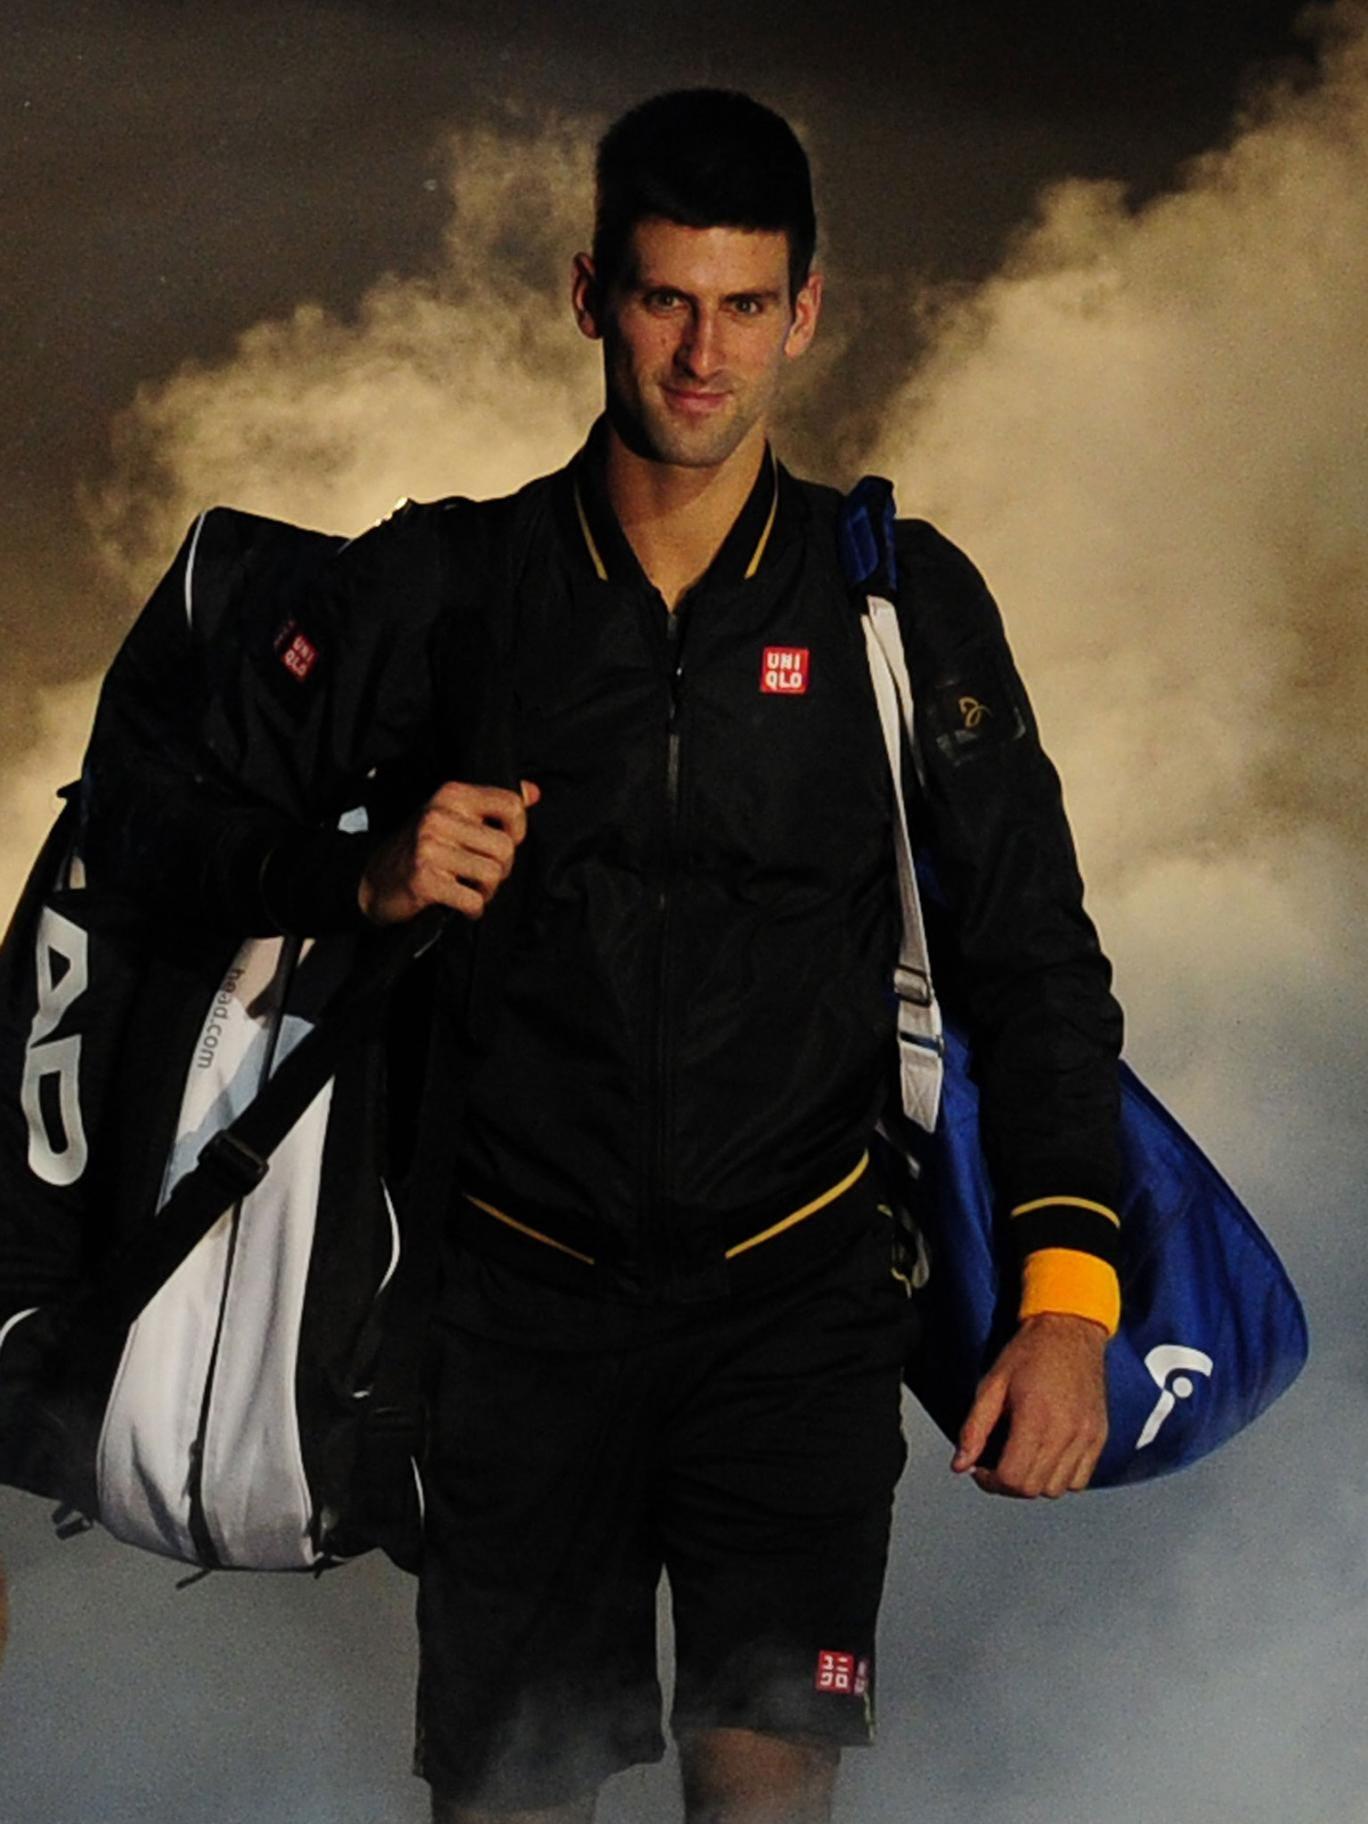 Djokovic also likes fairytale endings